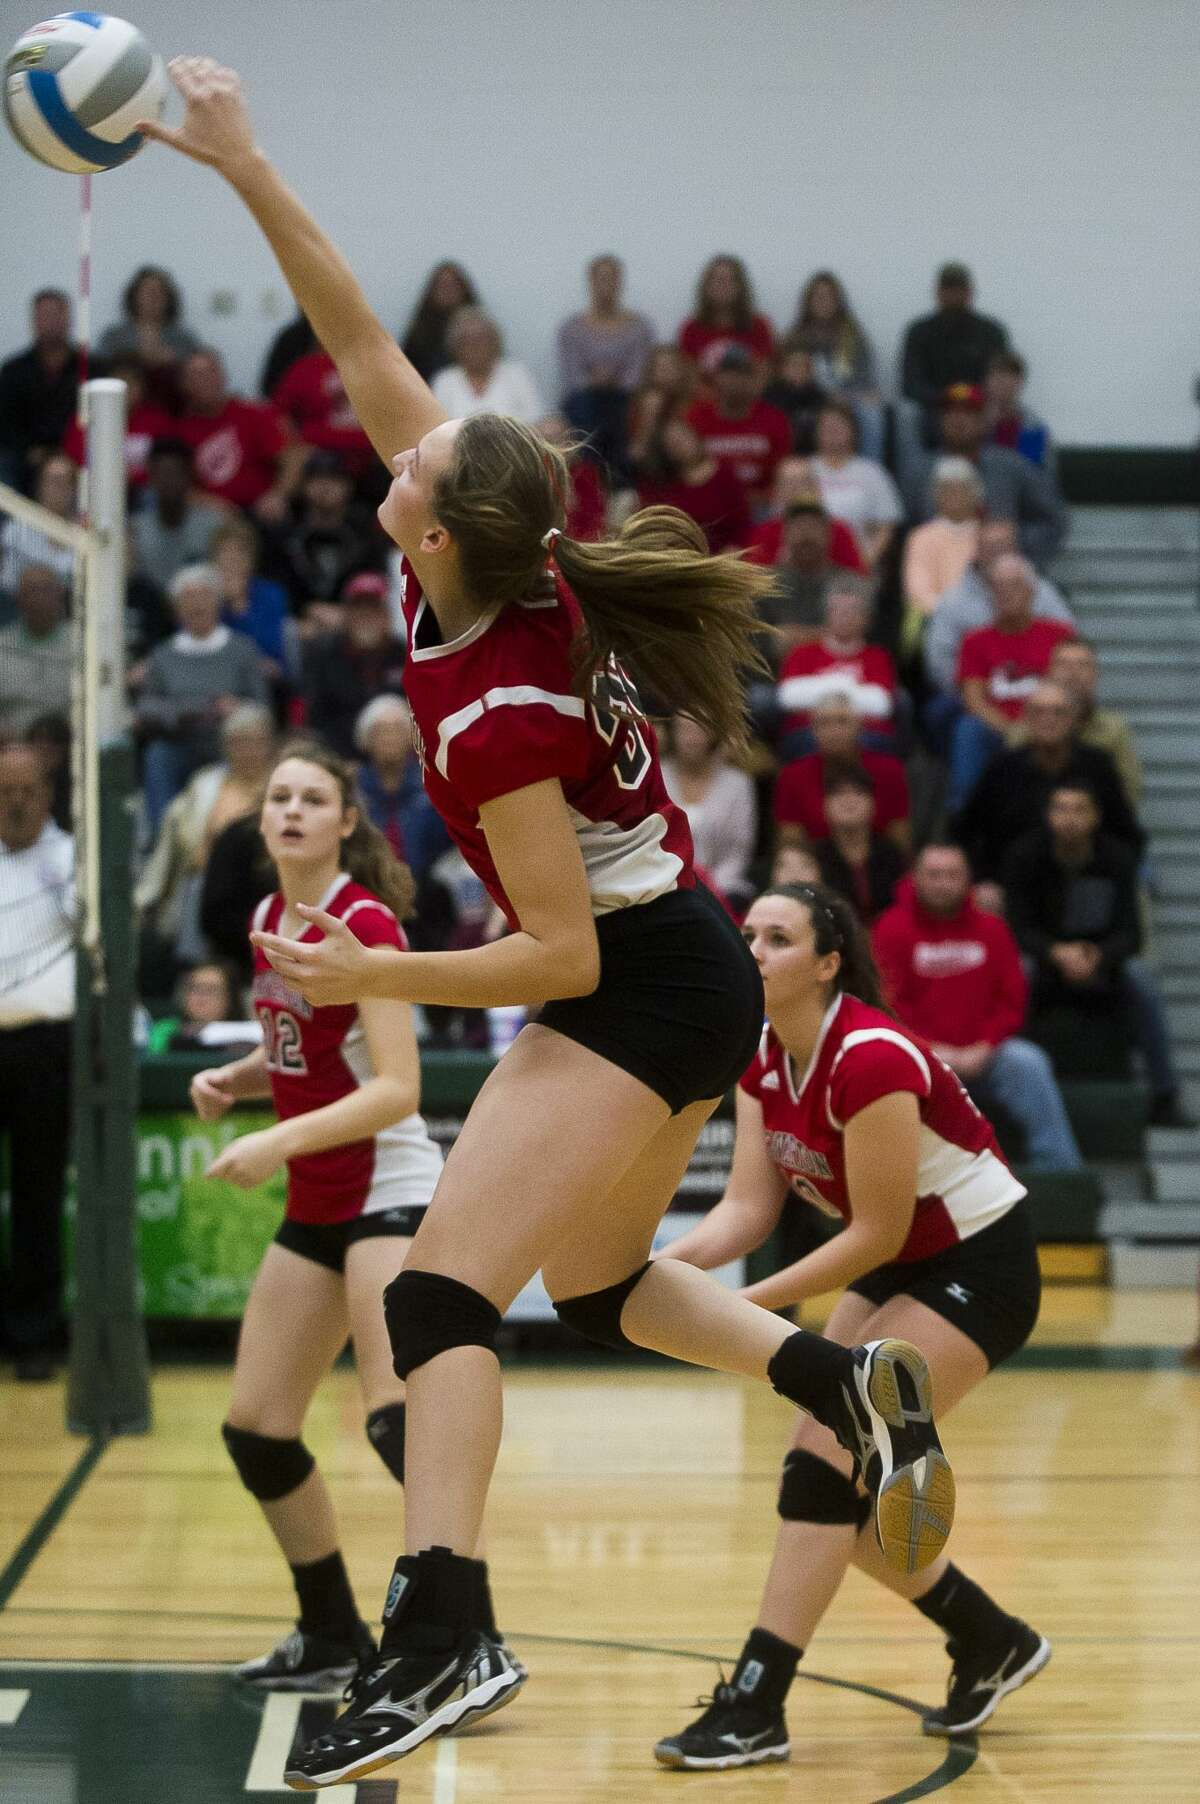 Beaverton freshman Molly Gerow spikes the ball during Beaverton's regional final against Ravenna on Tuesday, Nov. 7, 2017 at Pinconning High School. (Katy Kildee/kkildee@mdn.net)